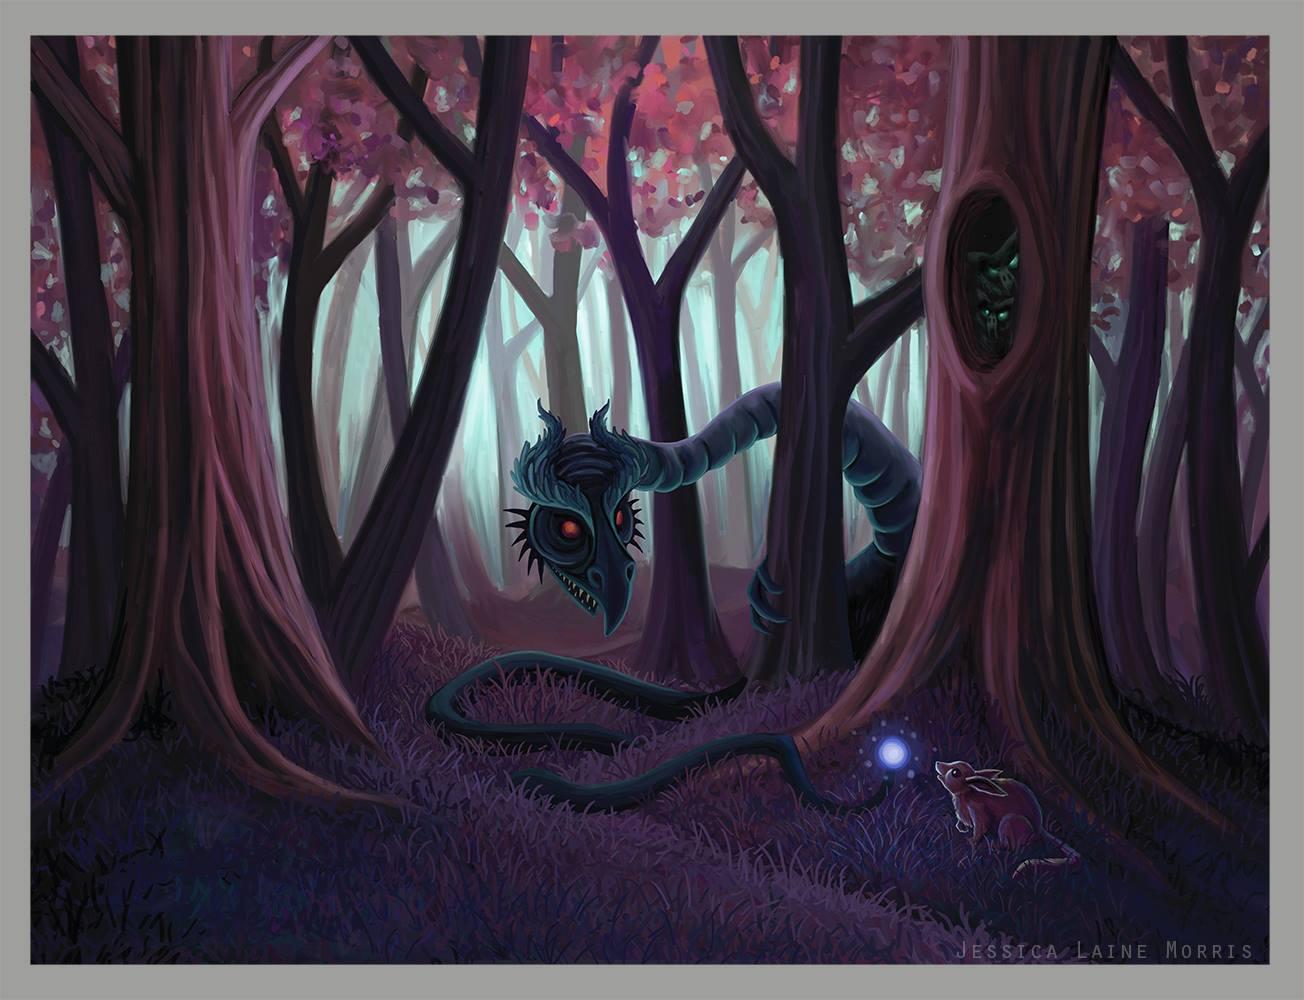 Jabberwocky Alice in Wonderland Dragon. Childrens book fantasy illustration.